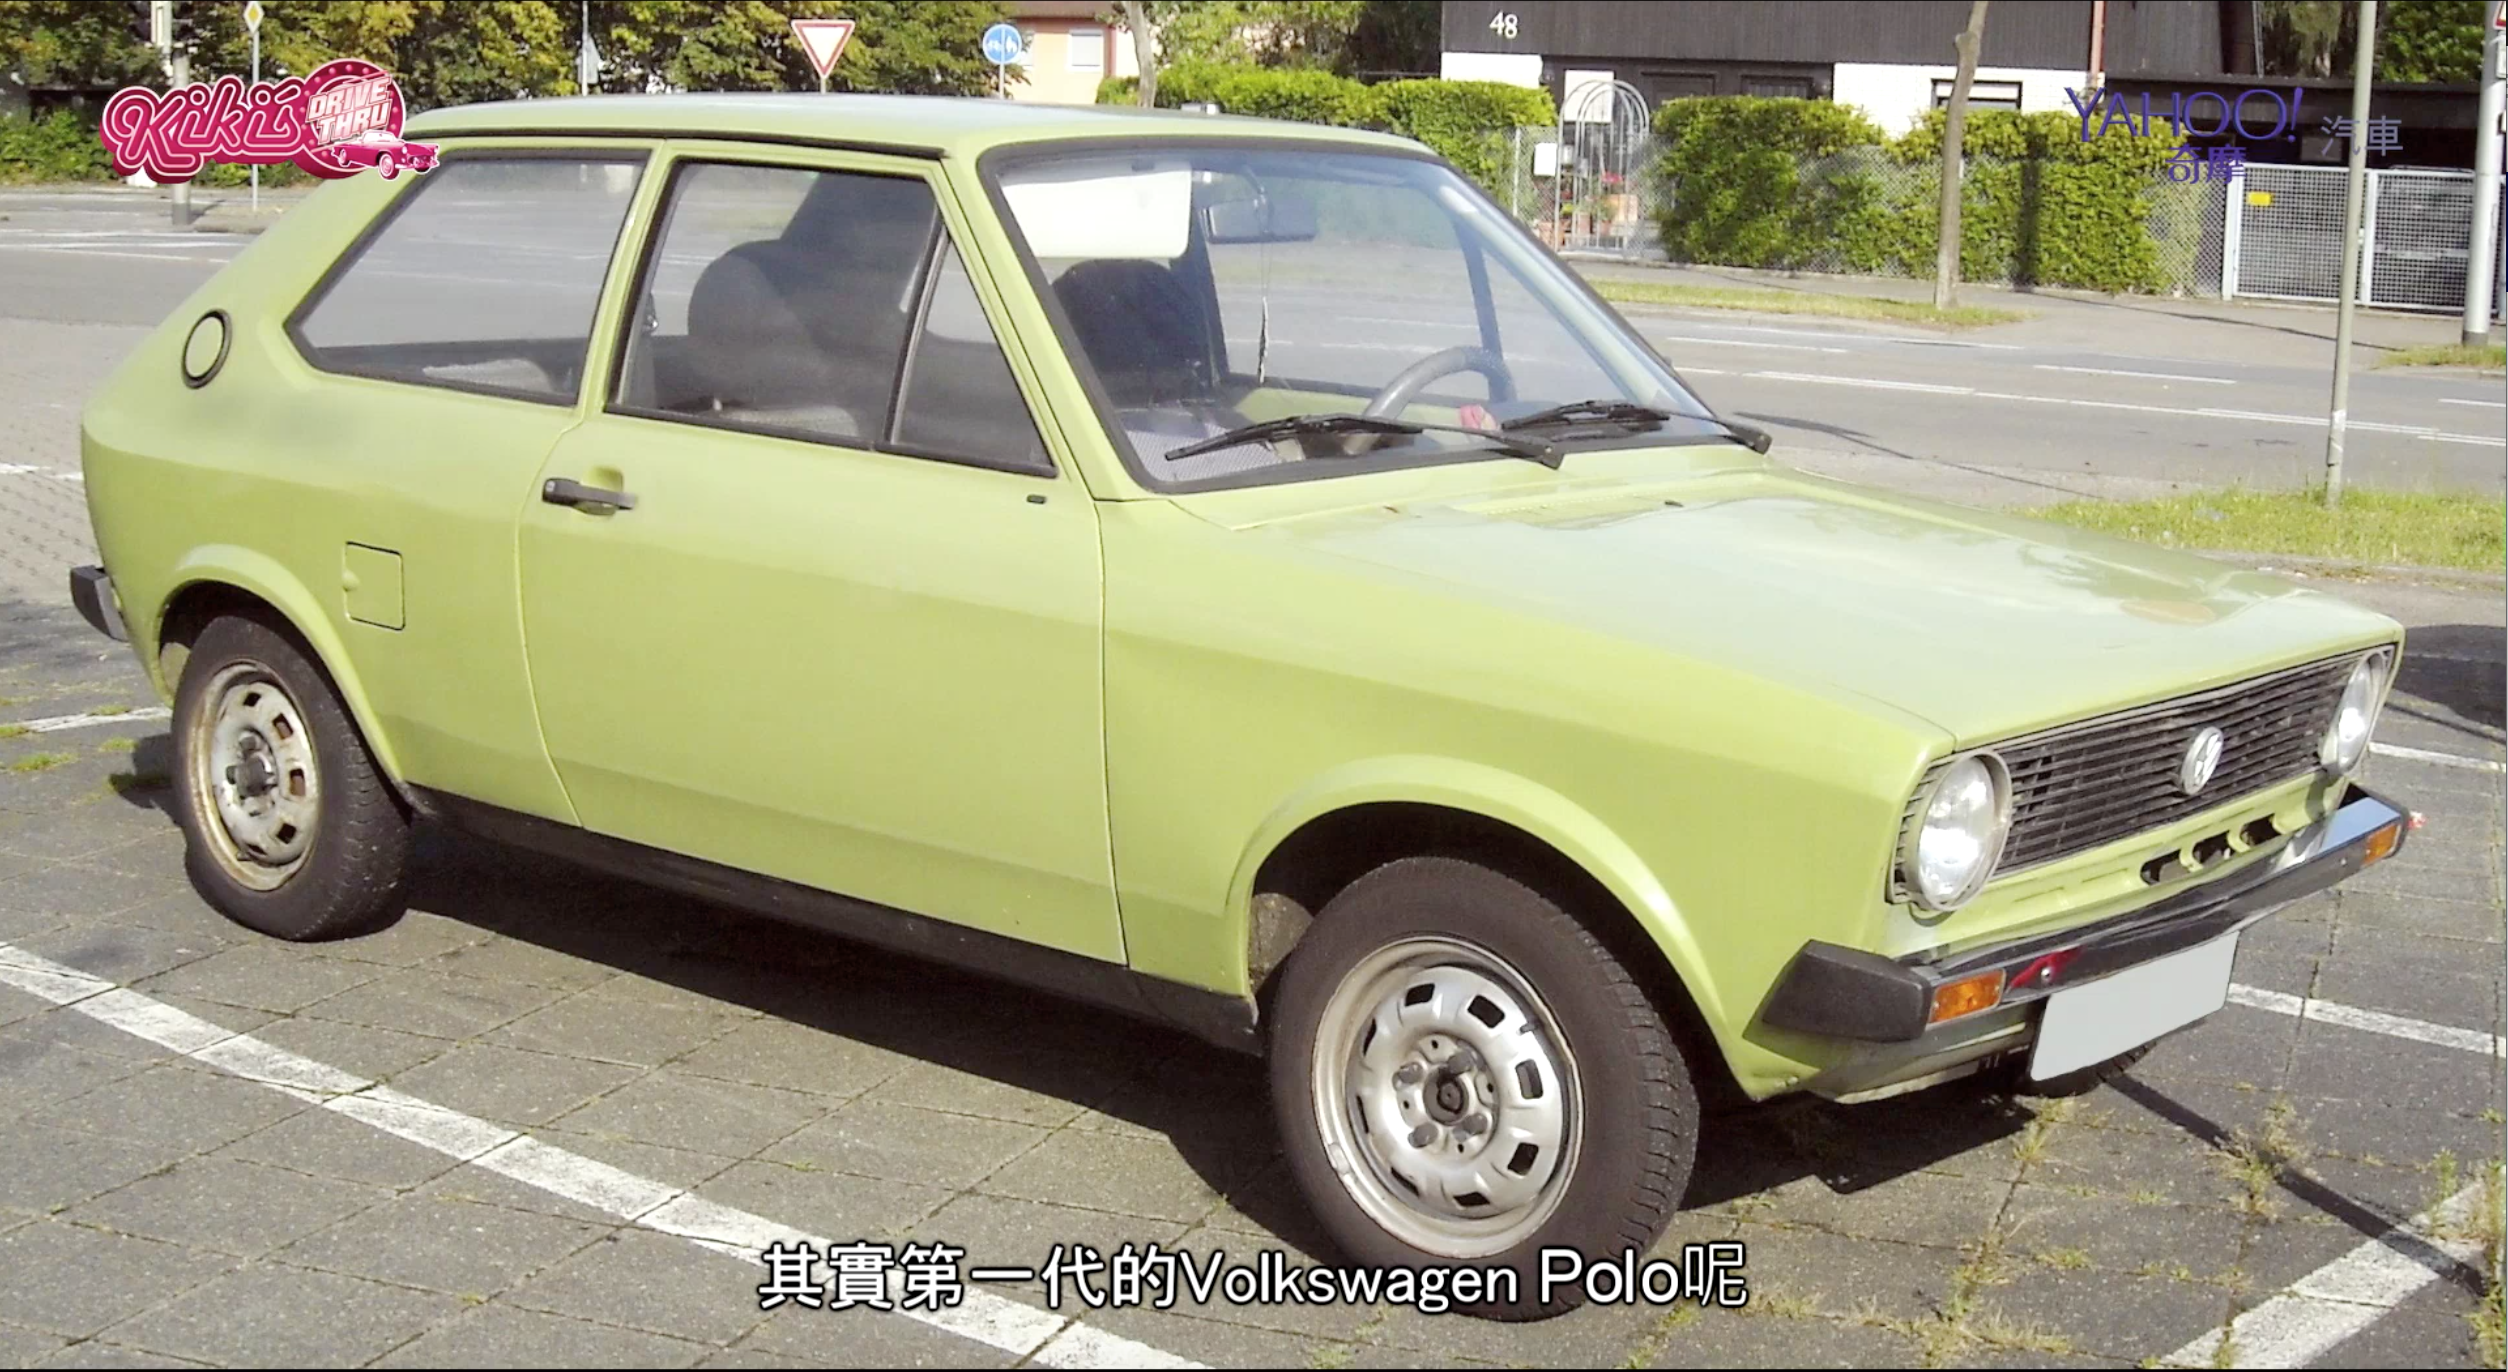 【Kiki's Drive-Thru】Vol.2 高速公路內側超車道龜速超危險!Volkswagen Polo名字的由來你知道嗎?